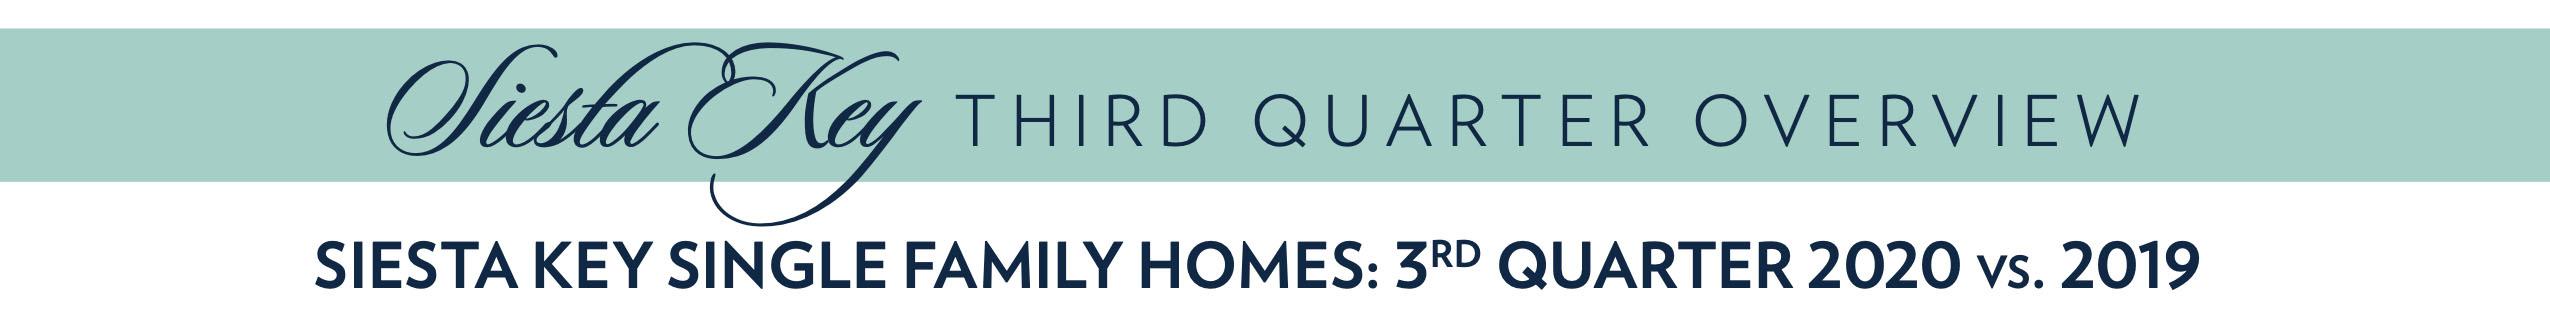 Siesta Key Luxury Real Estate Market Update - Single Family Homes Banner